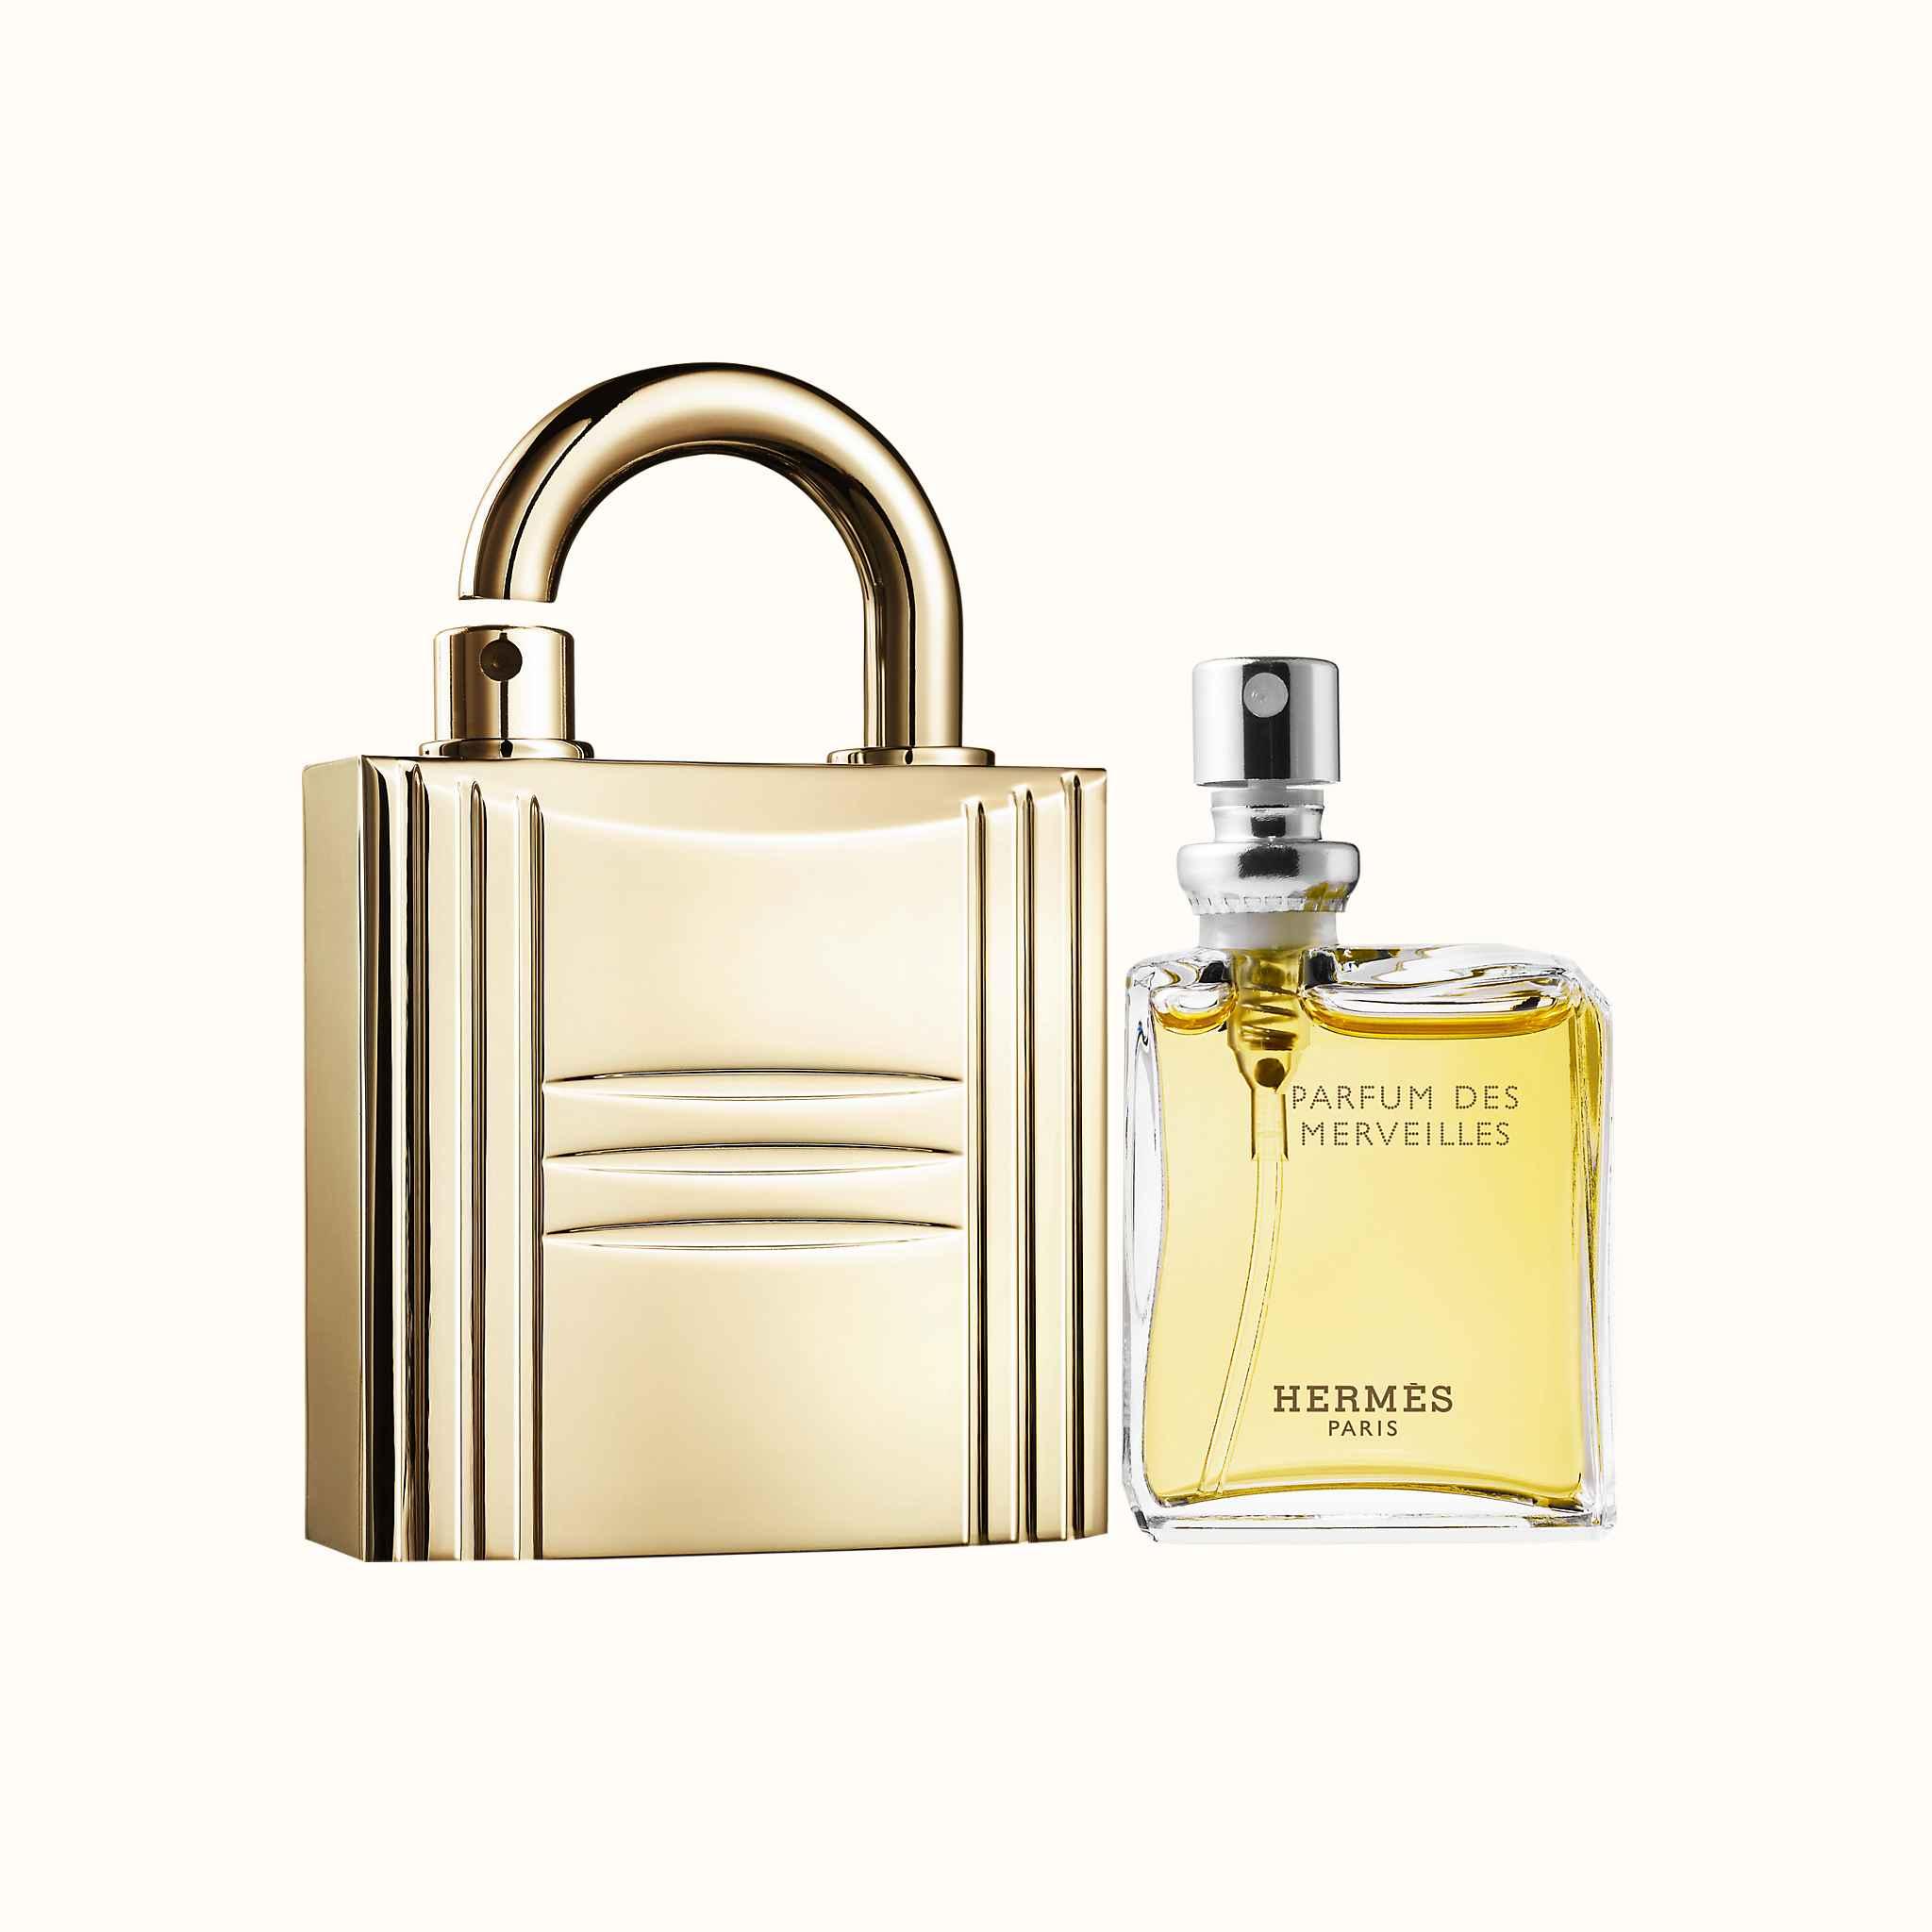 Parfum des Merveilles Nachfüllflakon Extrait de Parfum & Cadenas Or Nachfüllflakon